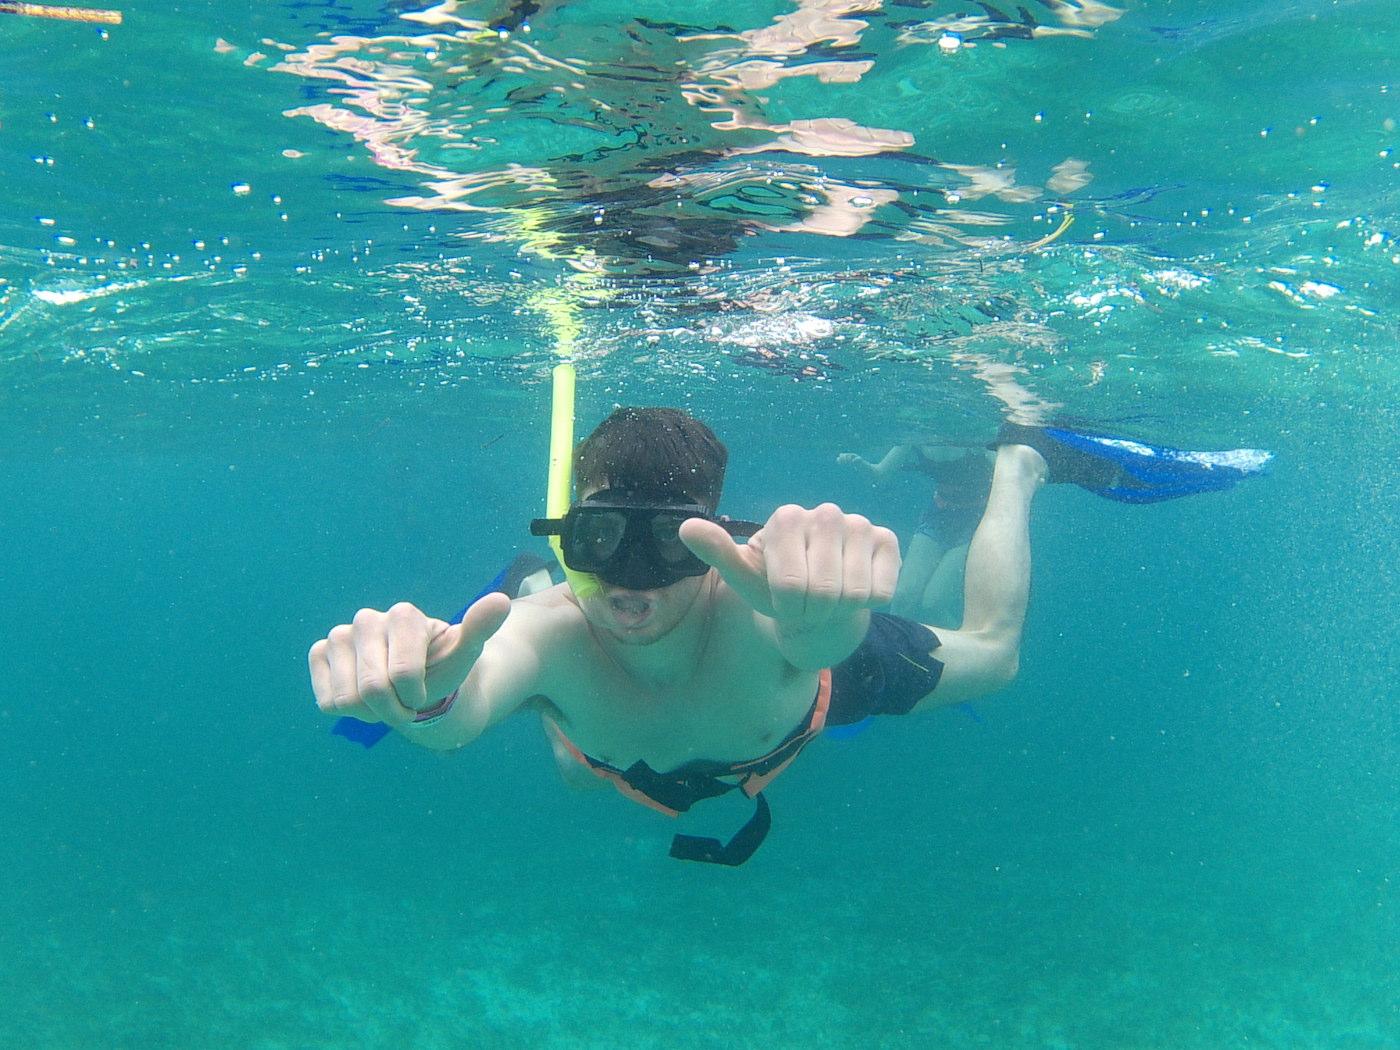 Catamaran-Snorkel-Trips-Cancun-Isla-Mujeres-14